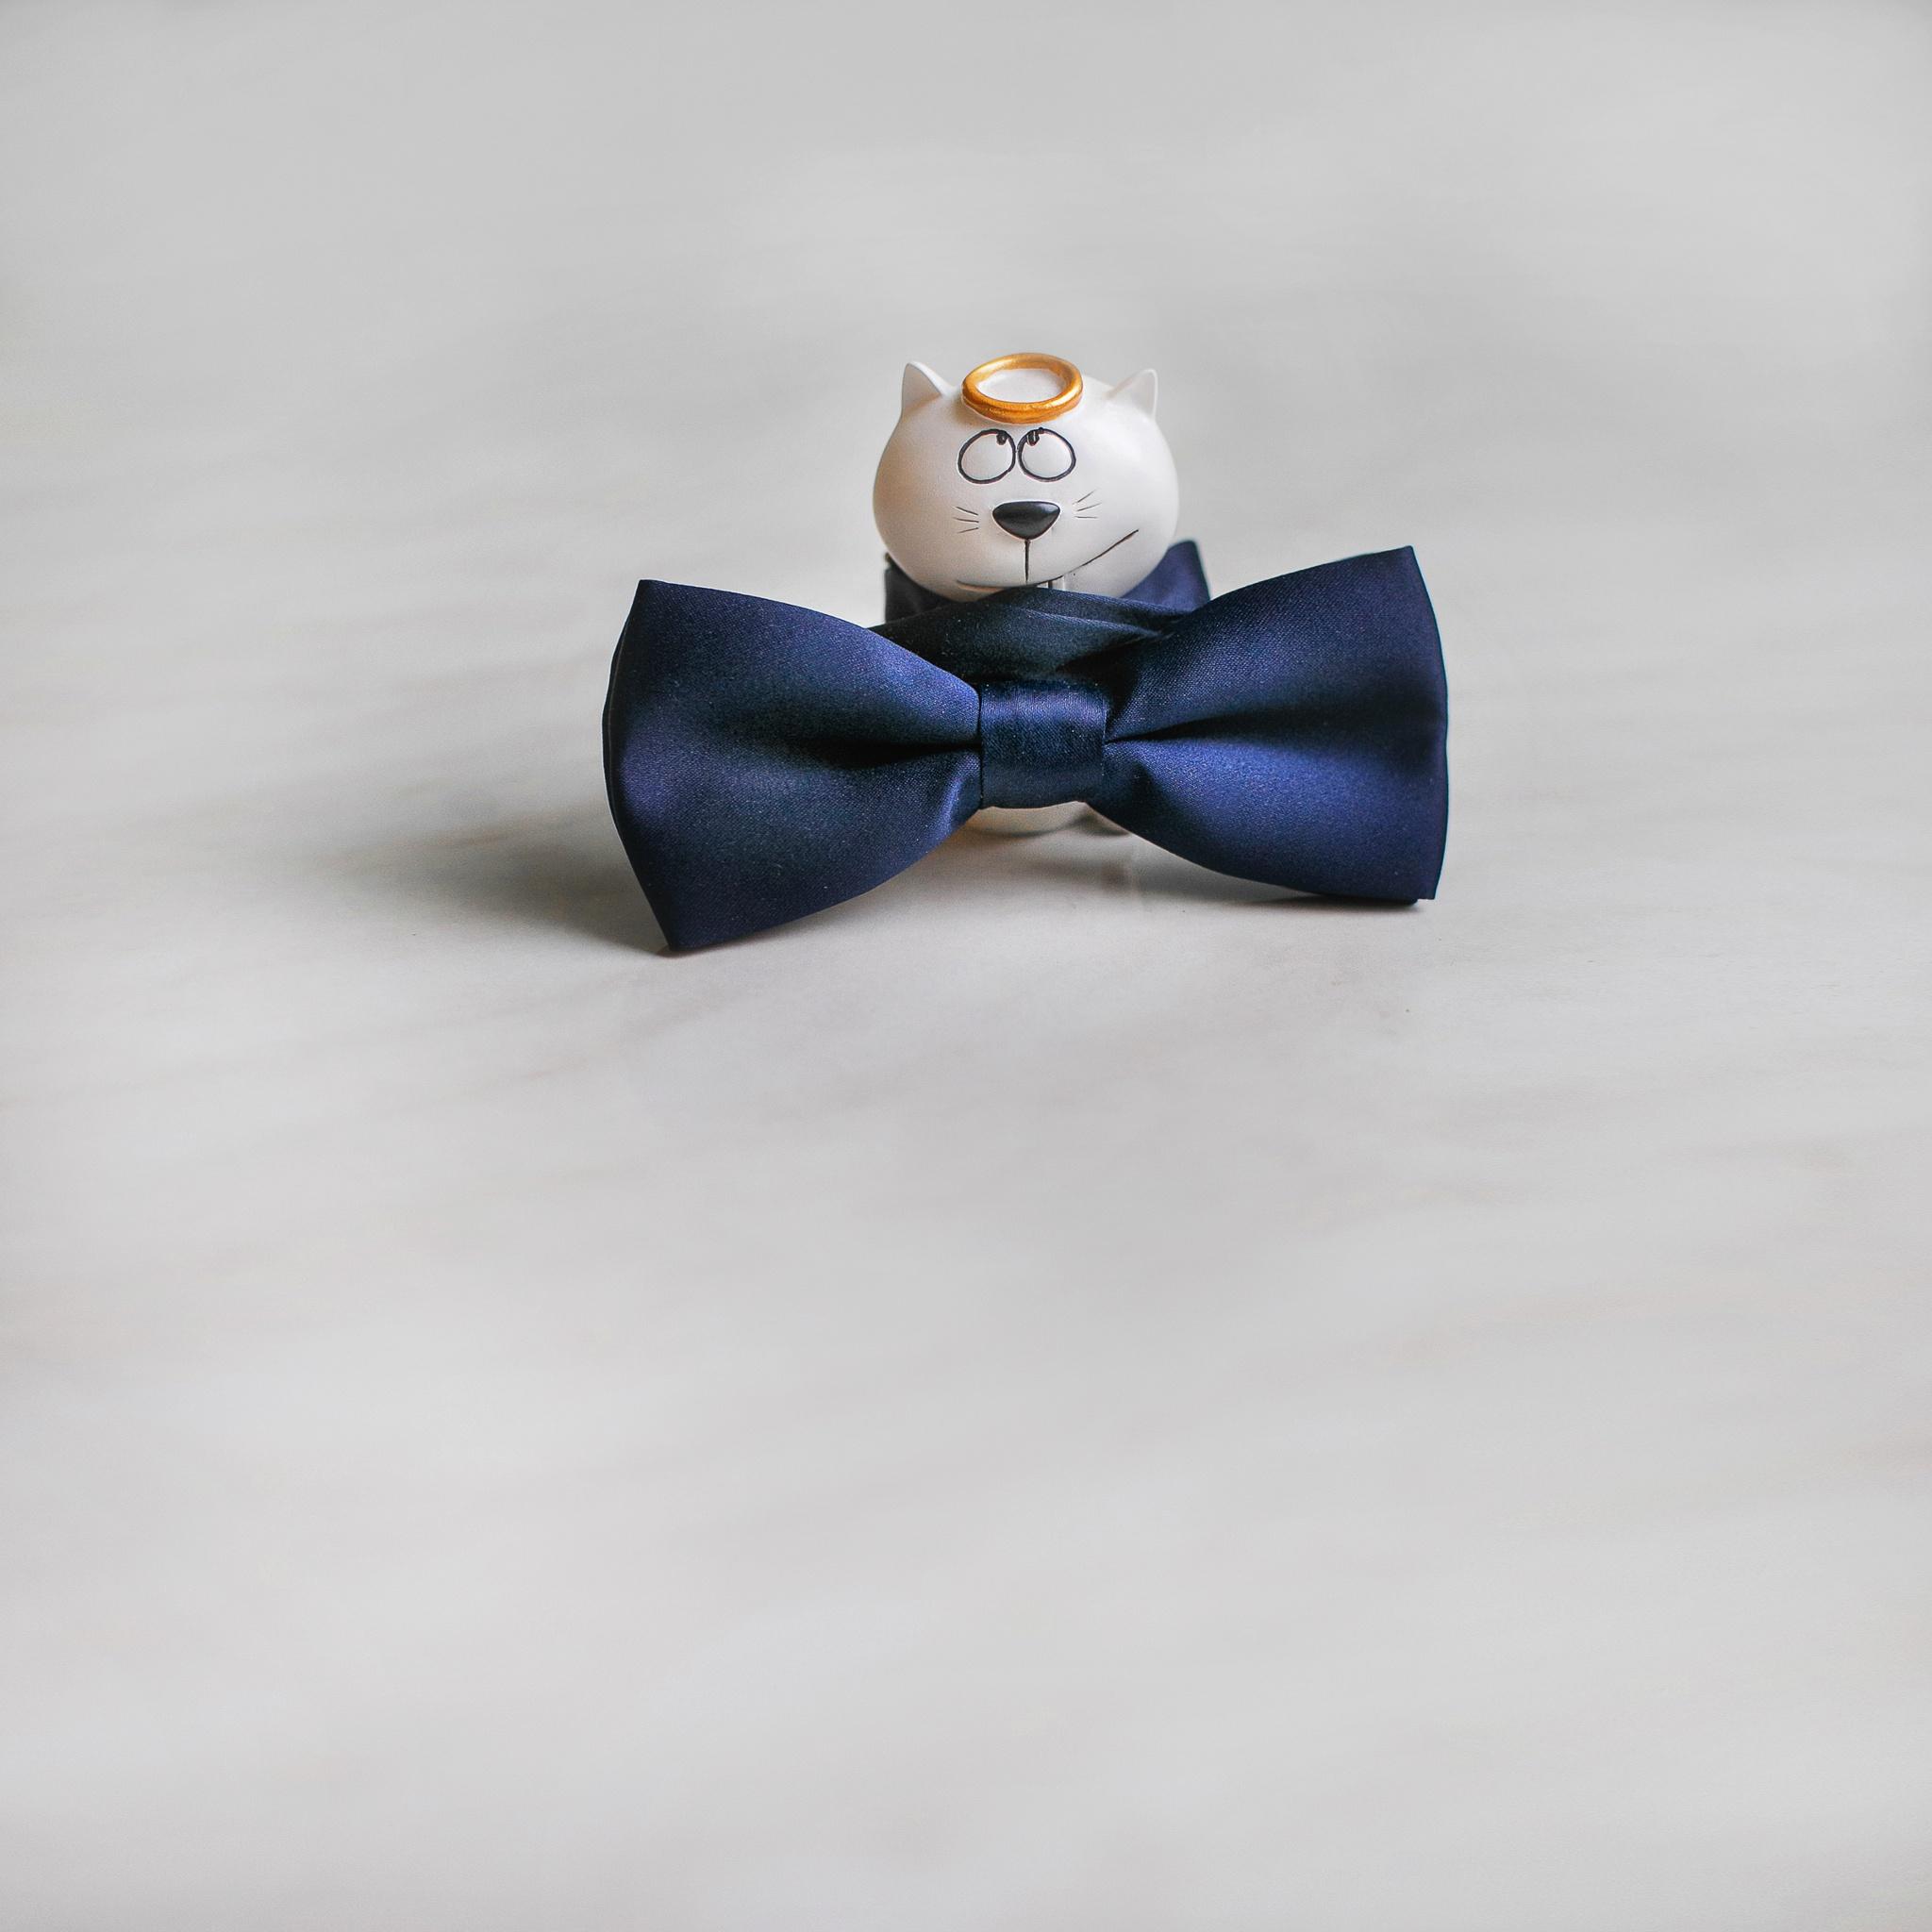 Funny bow tie by Dimitrij